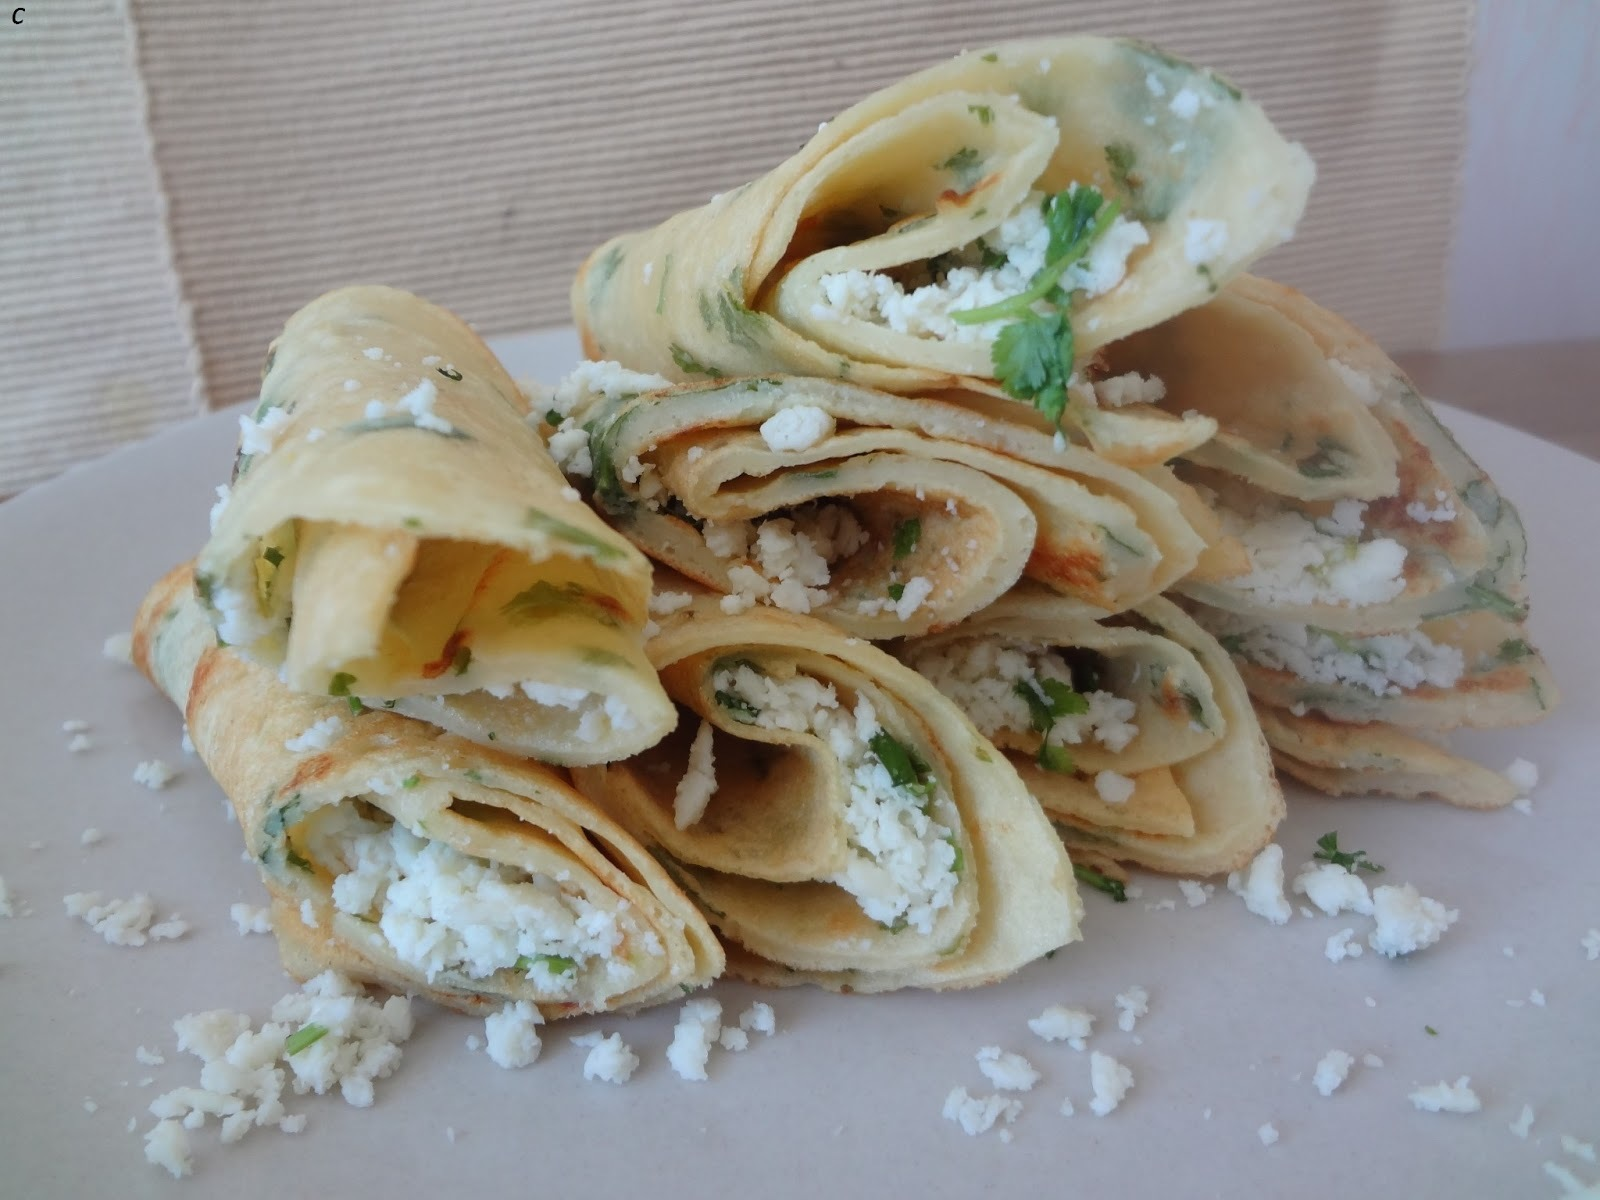 Lentil pancakes/ Moong dal cheela